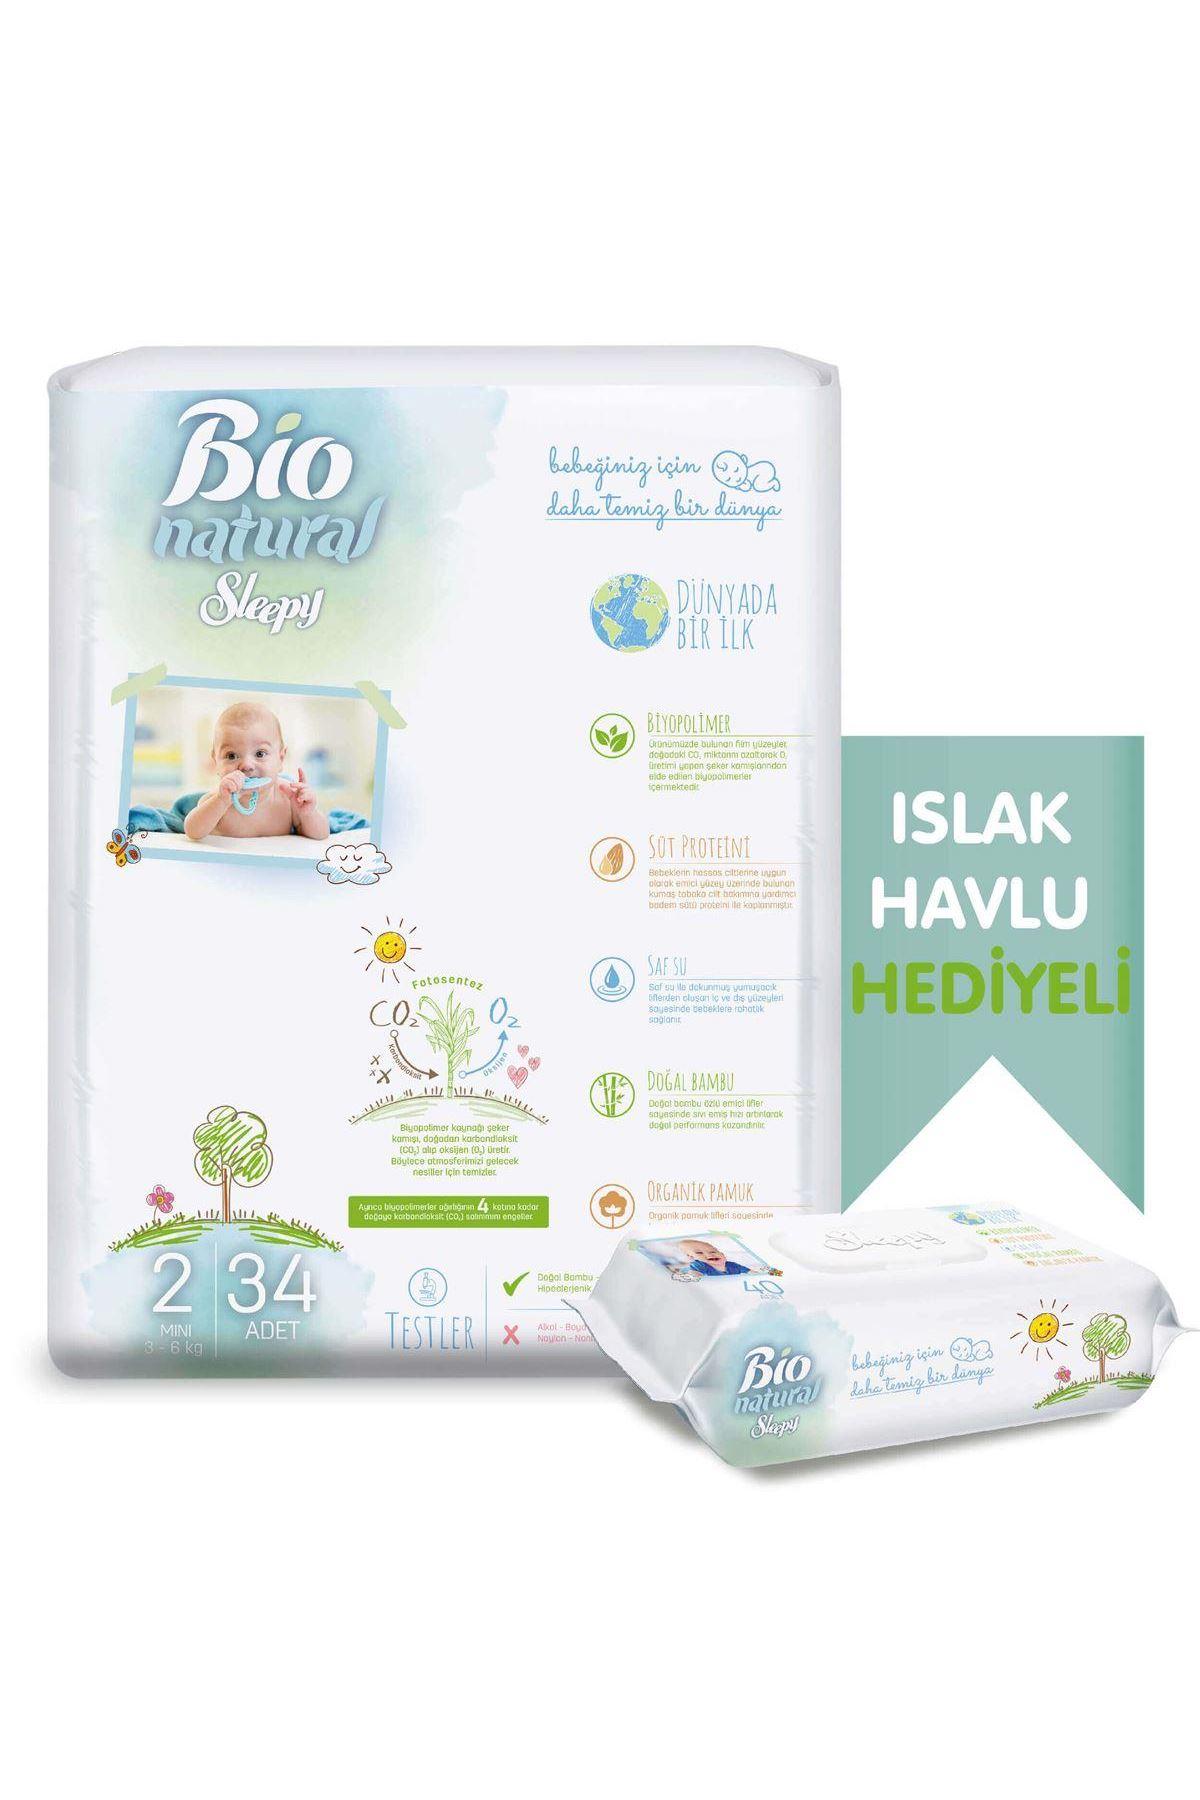 Sleepy Bio Naturel Bebek Bezi Jumbo 2 Beden 3-6 Kg 34 Adet (Islak Havlu Hediyeli)